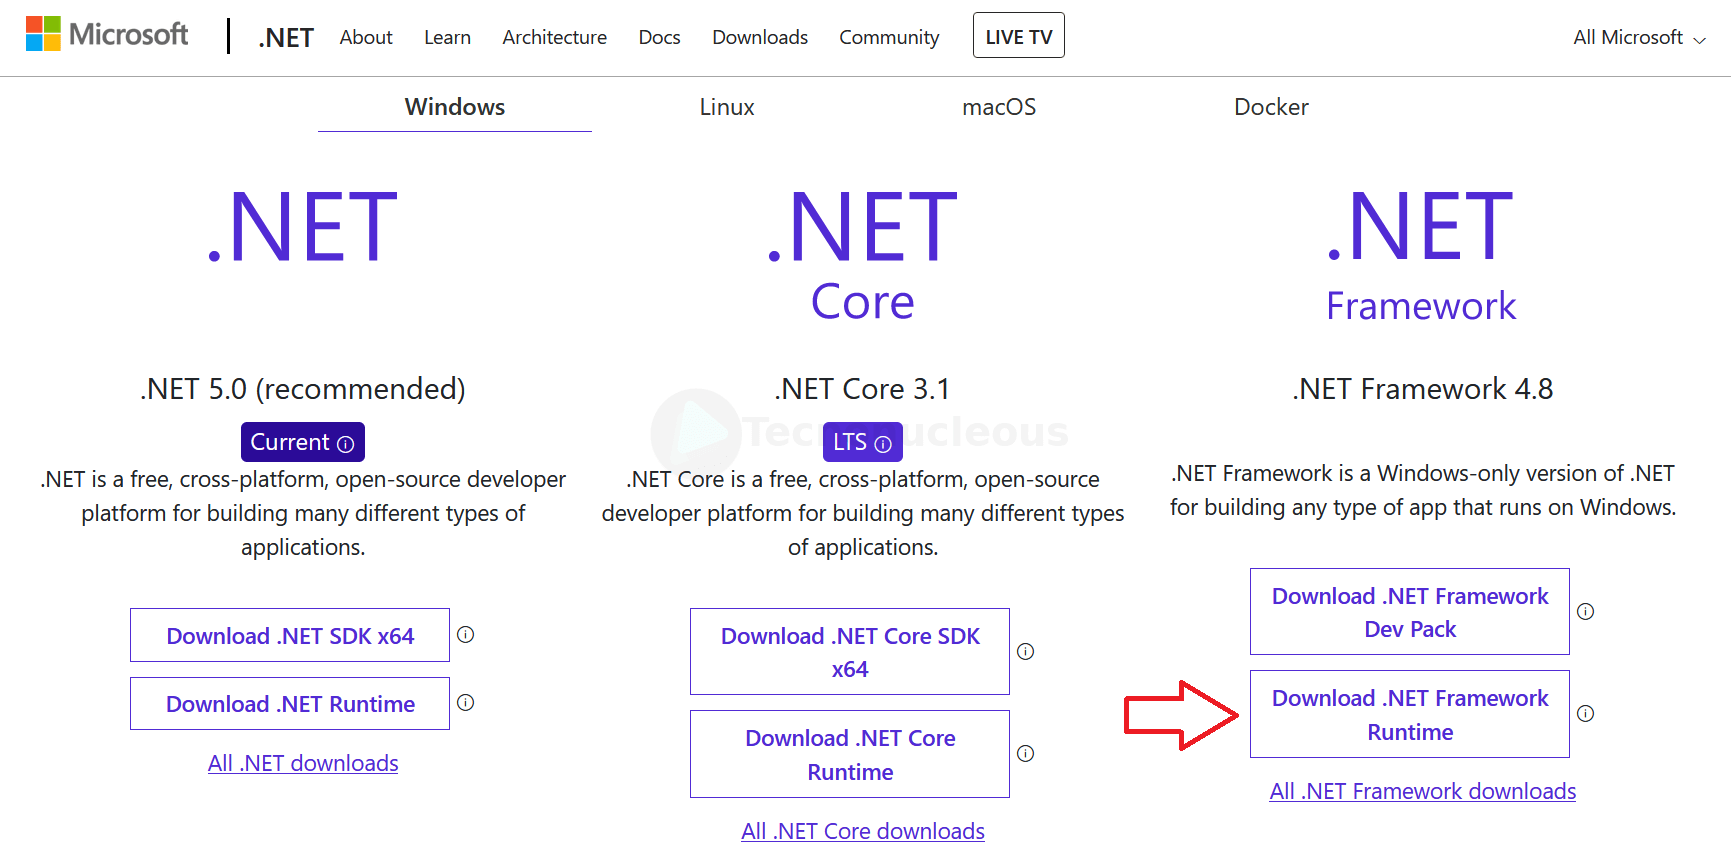 Descargar NET Framework Windows 10